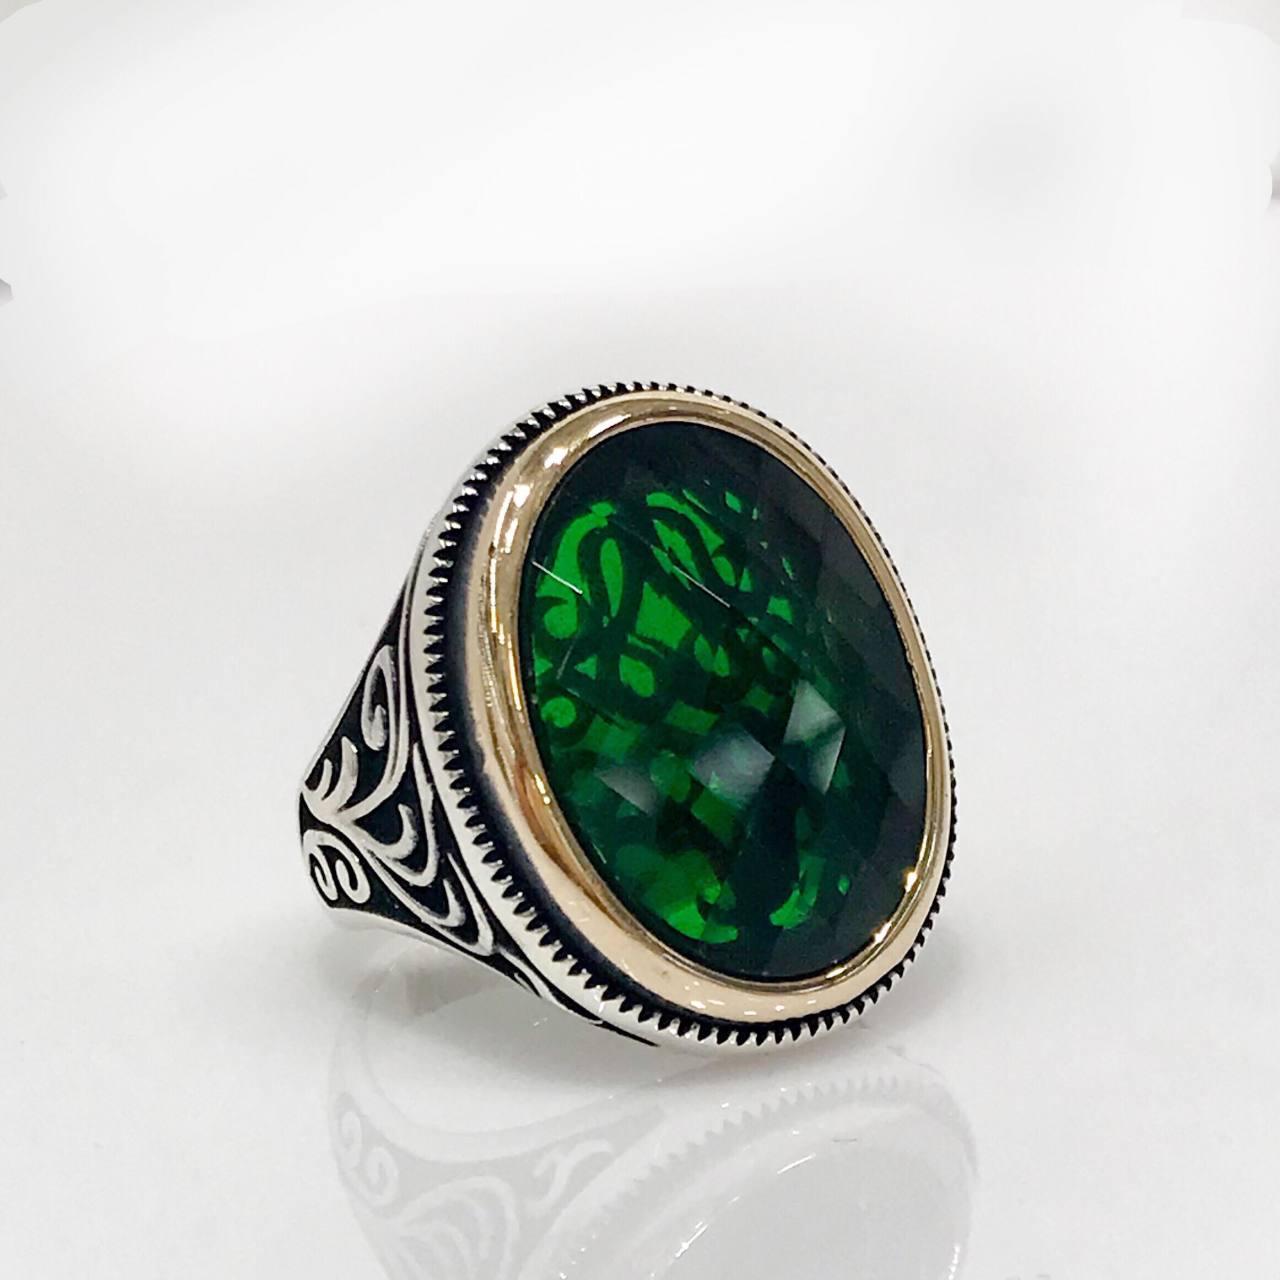 Green Zircon Oval Handwork Silver Men 'S Ring